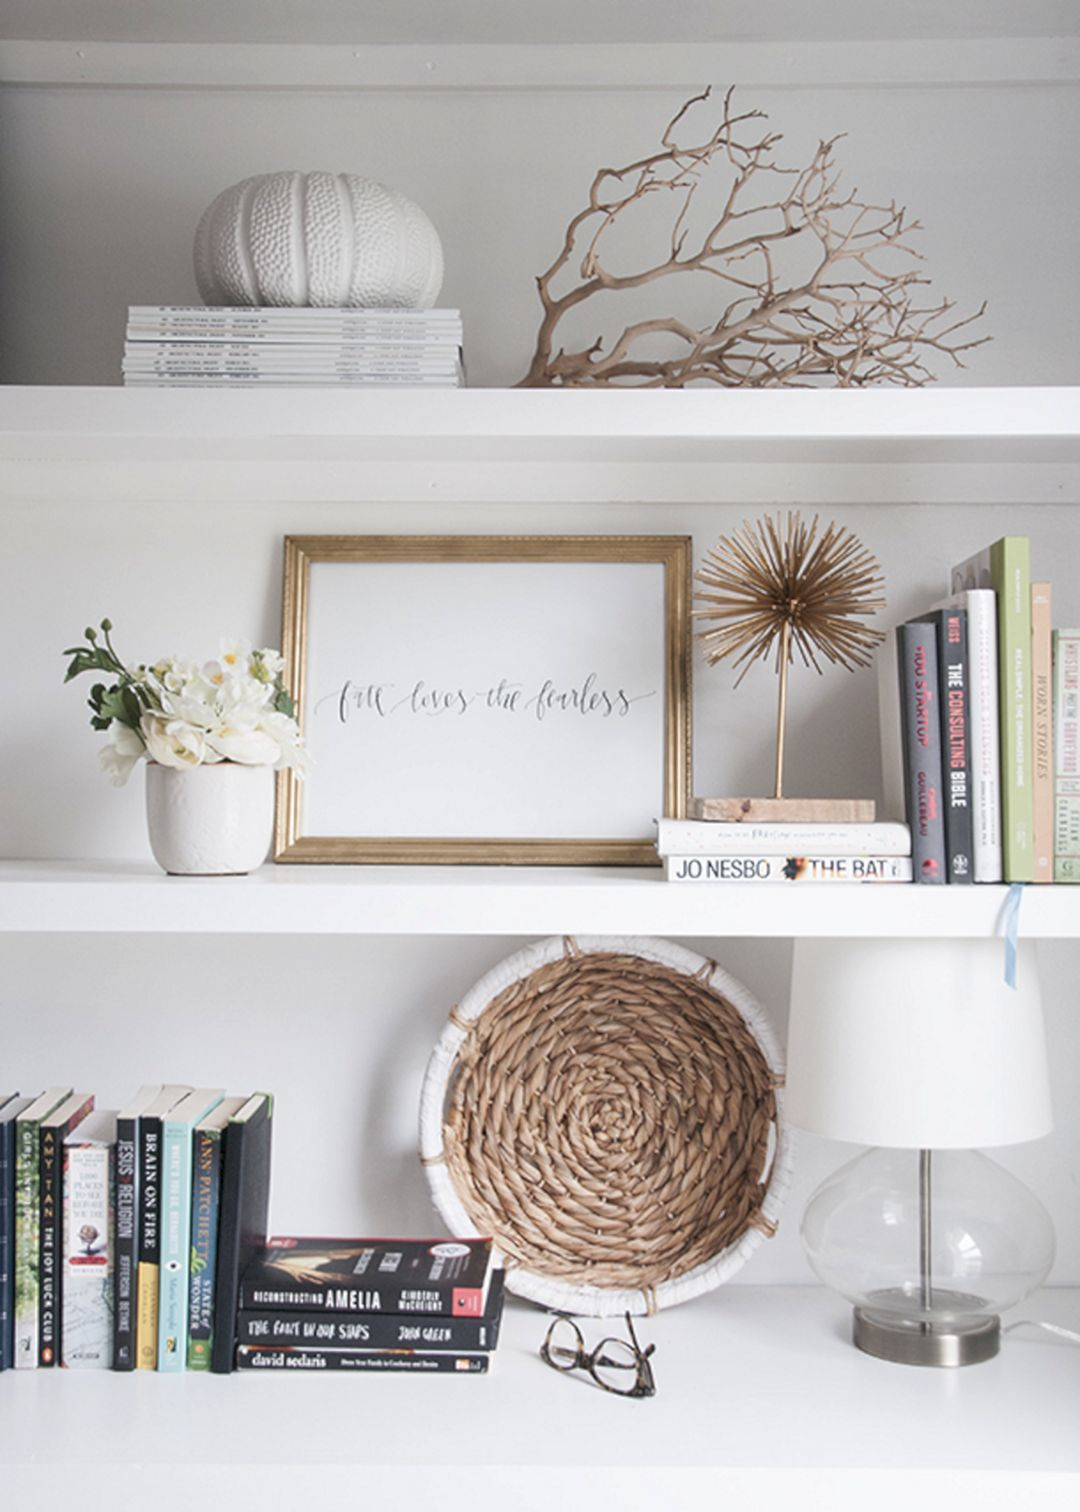 Outstanding 40 Most Popular Bookshelf Decorating Ideas For Your Home Https Freshouz Com 40 Most Popular Books Styling Bookshelves Bookshelf Decor Home Decor